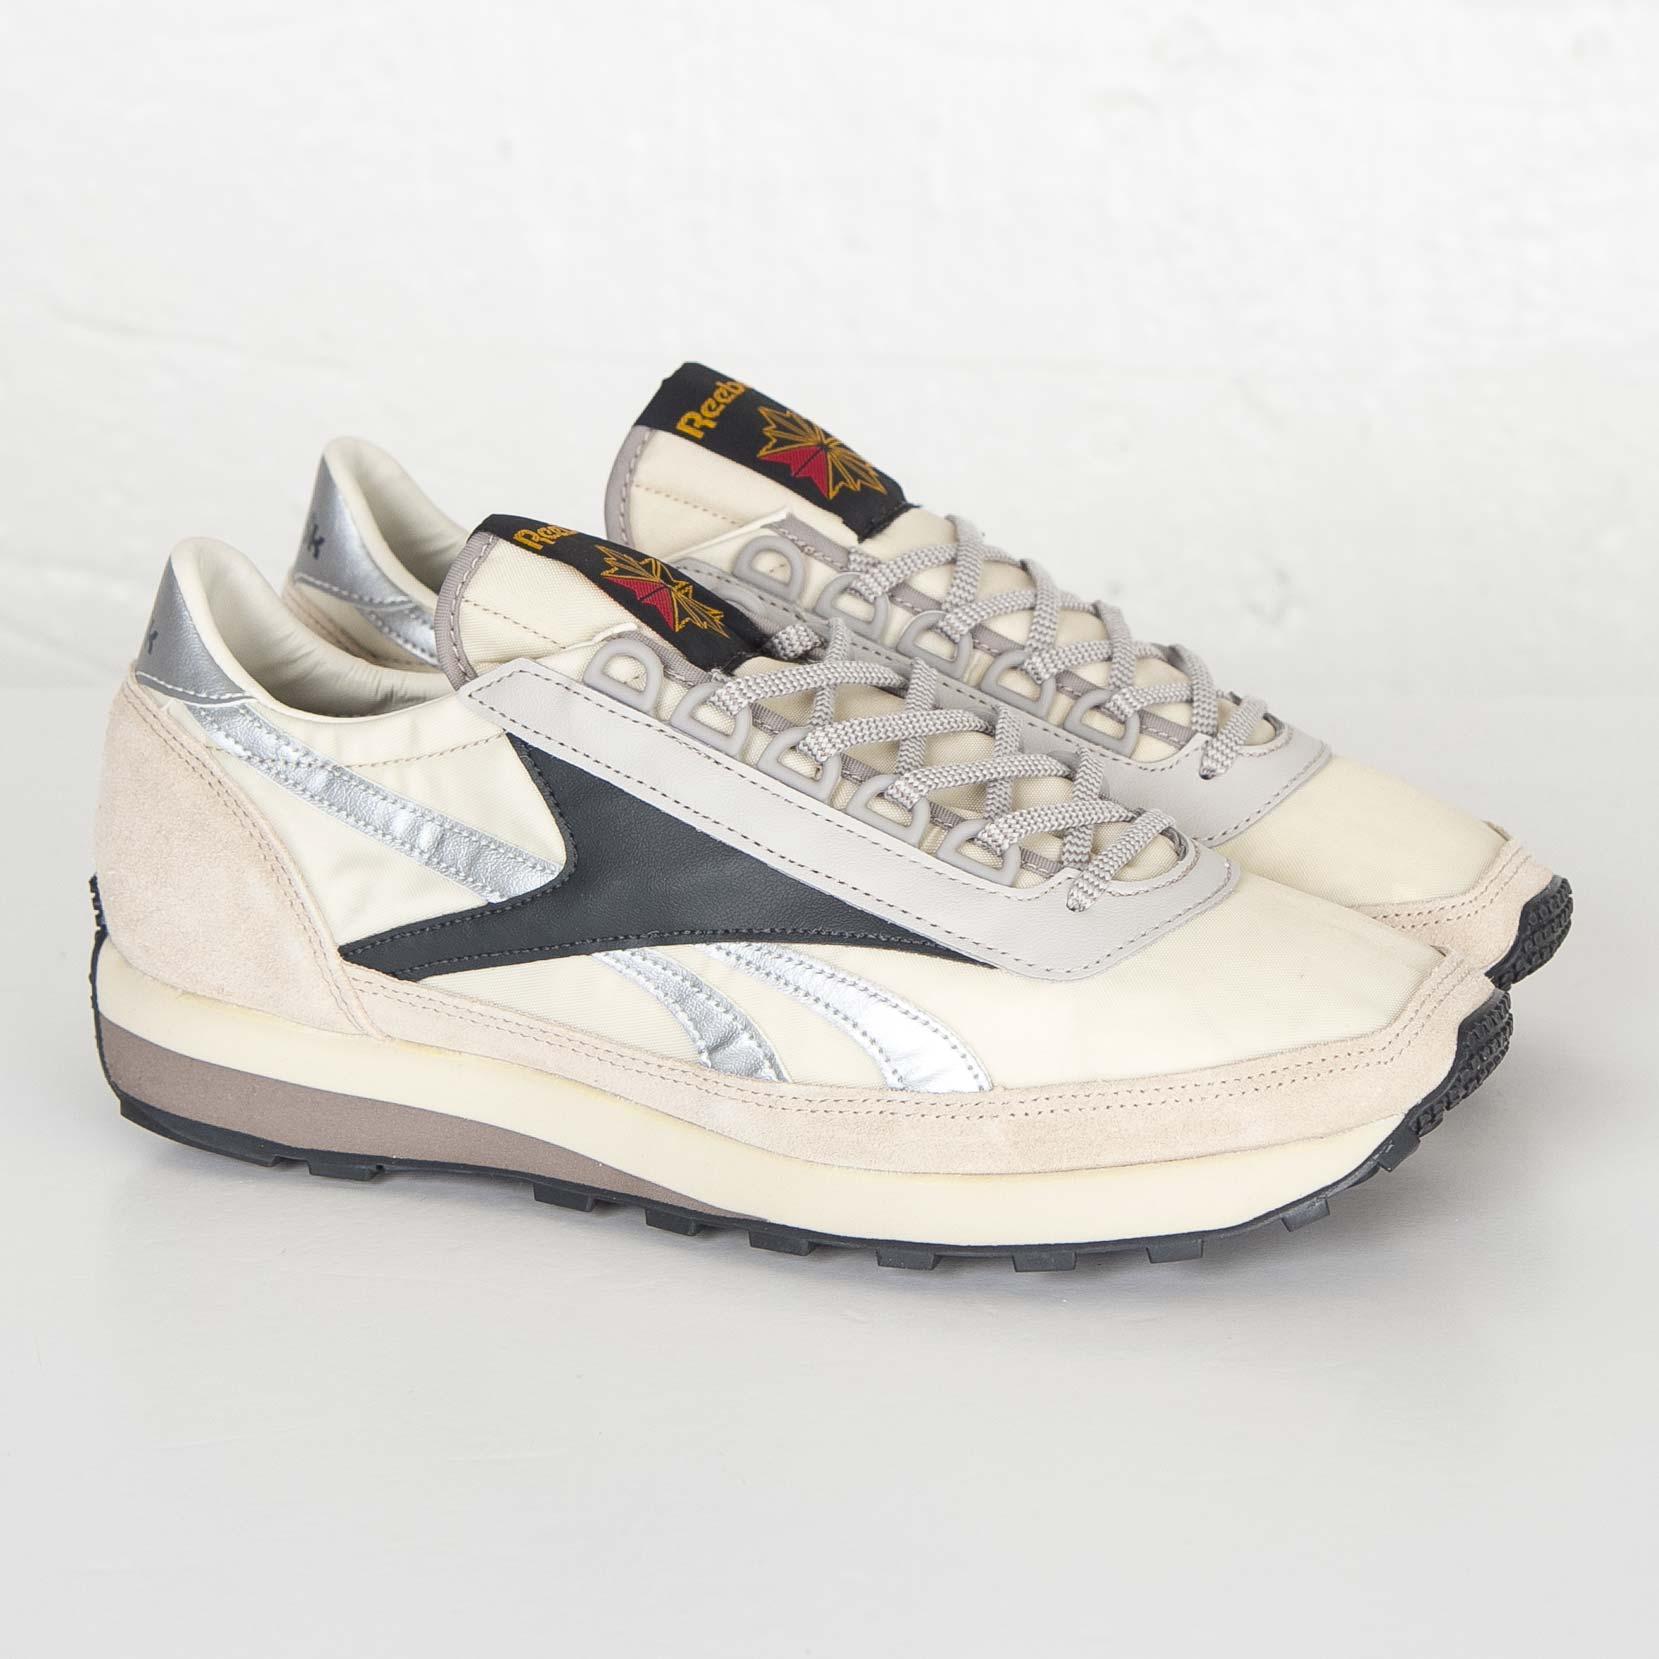 AZTEC OG - FOOTWEAR - Low-tops & sneakers Reebok 9nEwzZ